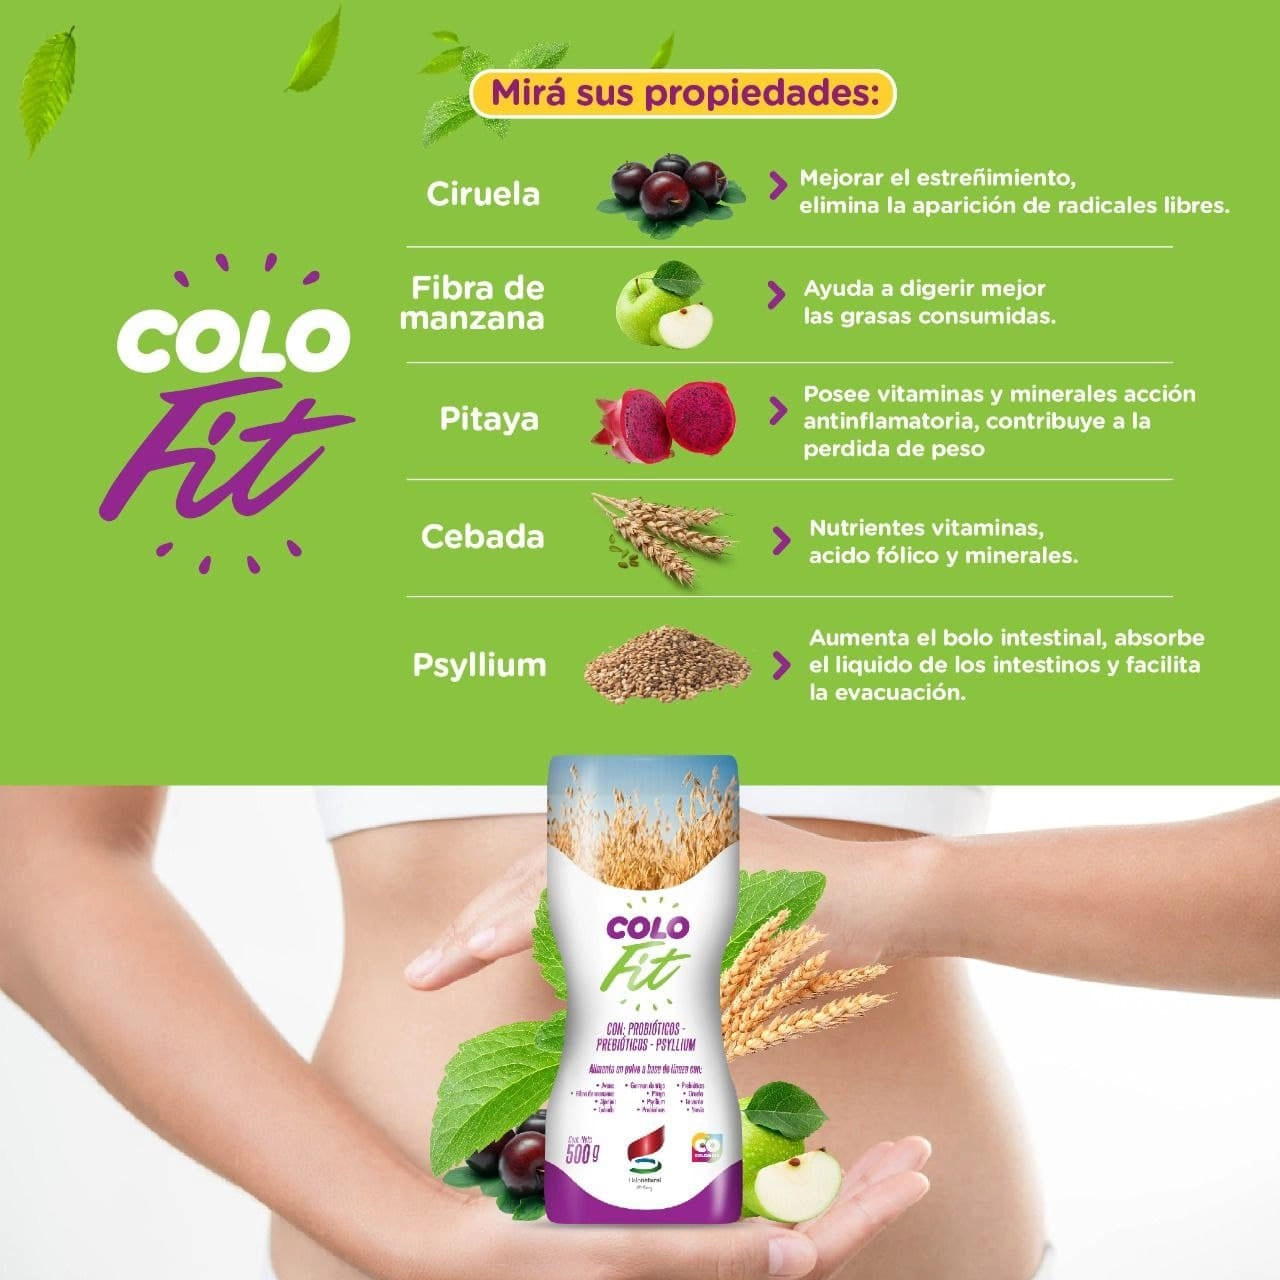 colofit-colon-propiedades